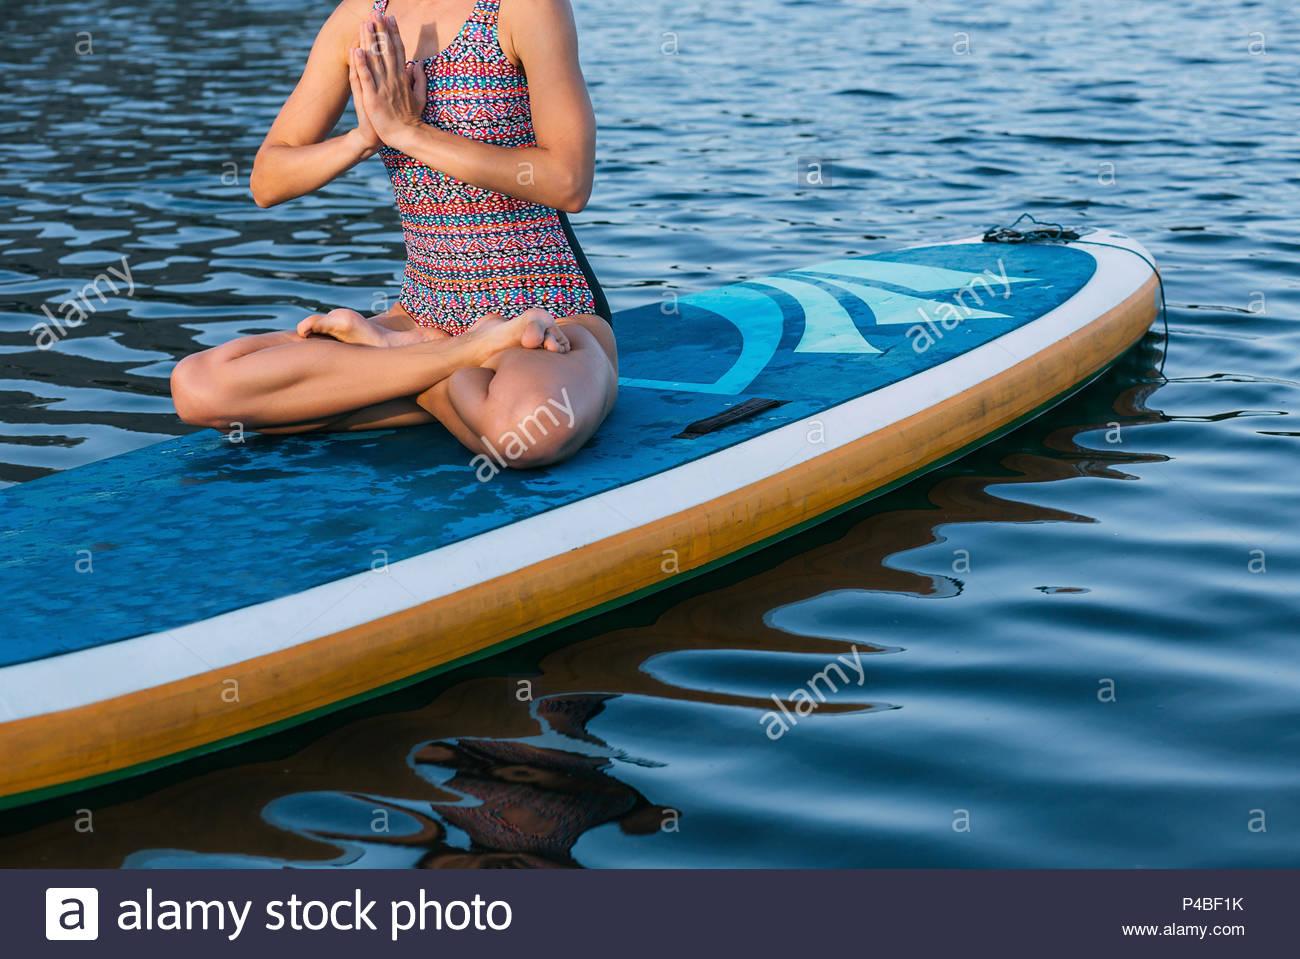 woman doing yoga on sup board - Stock Image